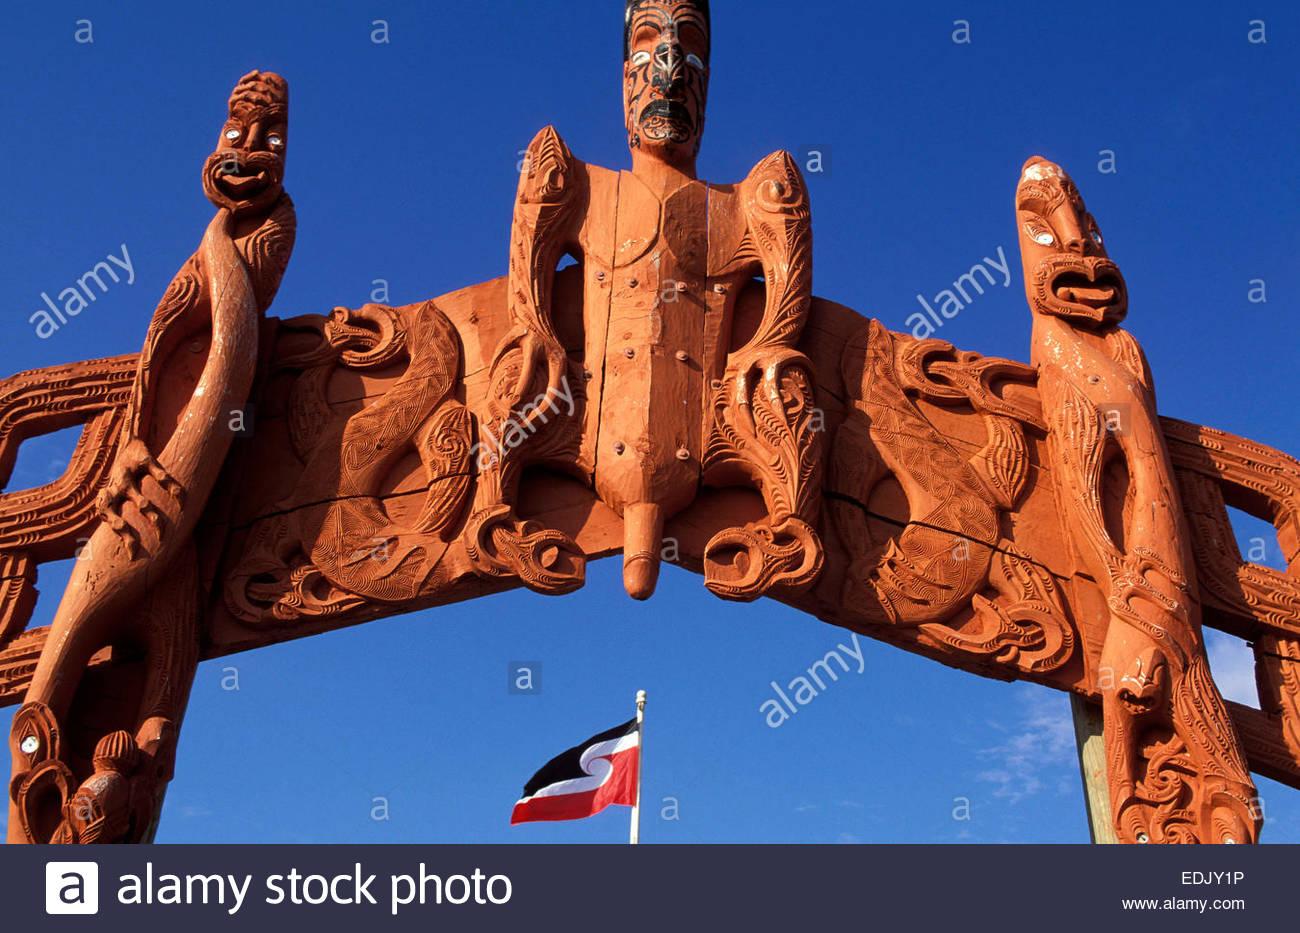 Maori sacred sculpture, North Island, New Zealand. - Stock Image